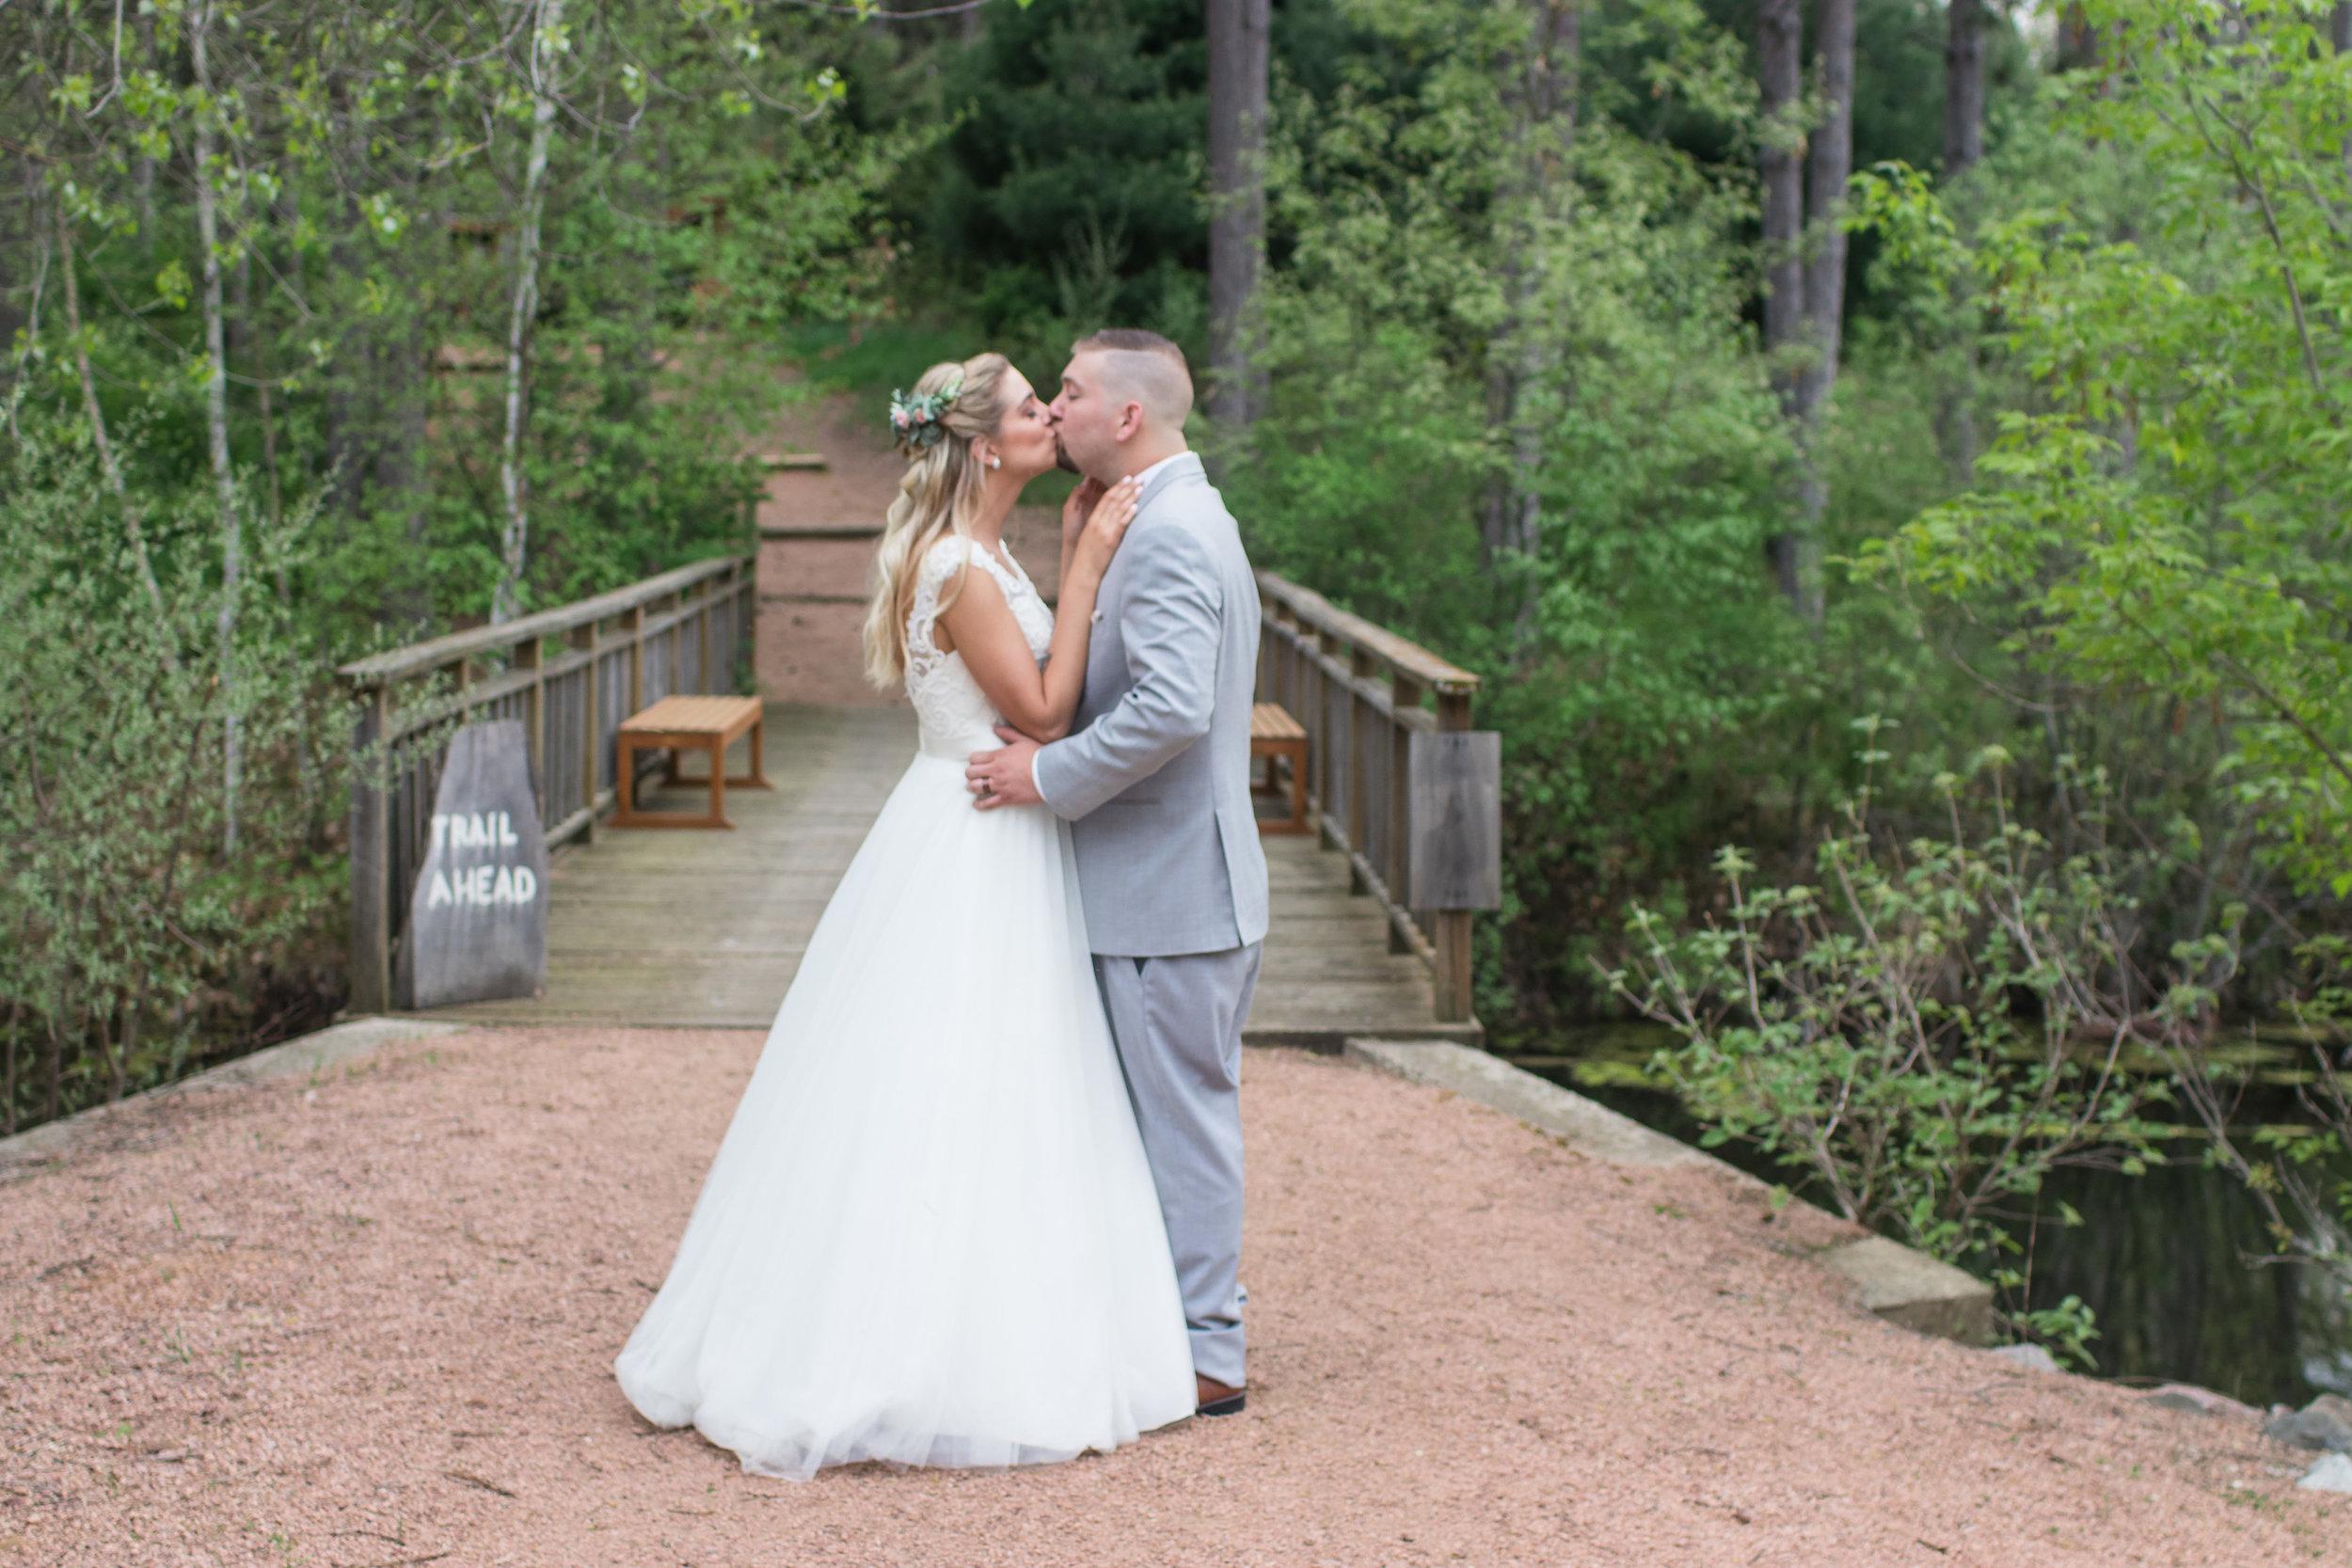 Neil+Kelsey_bridalphotos-4-3.jpg